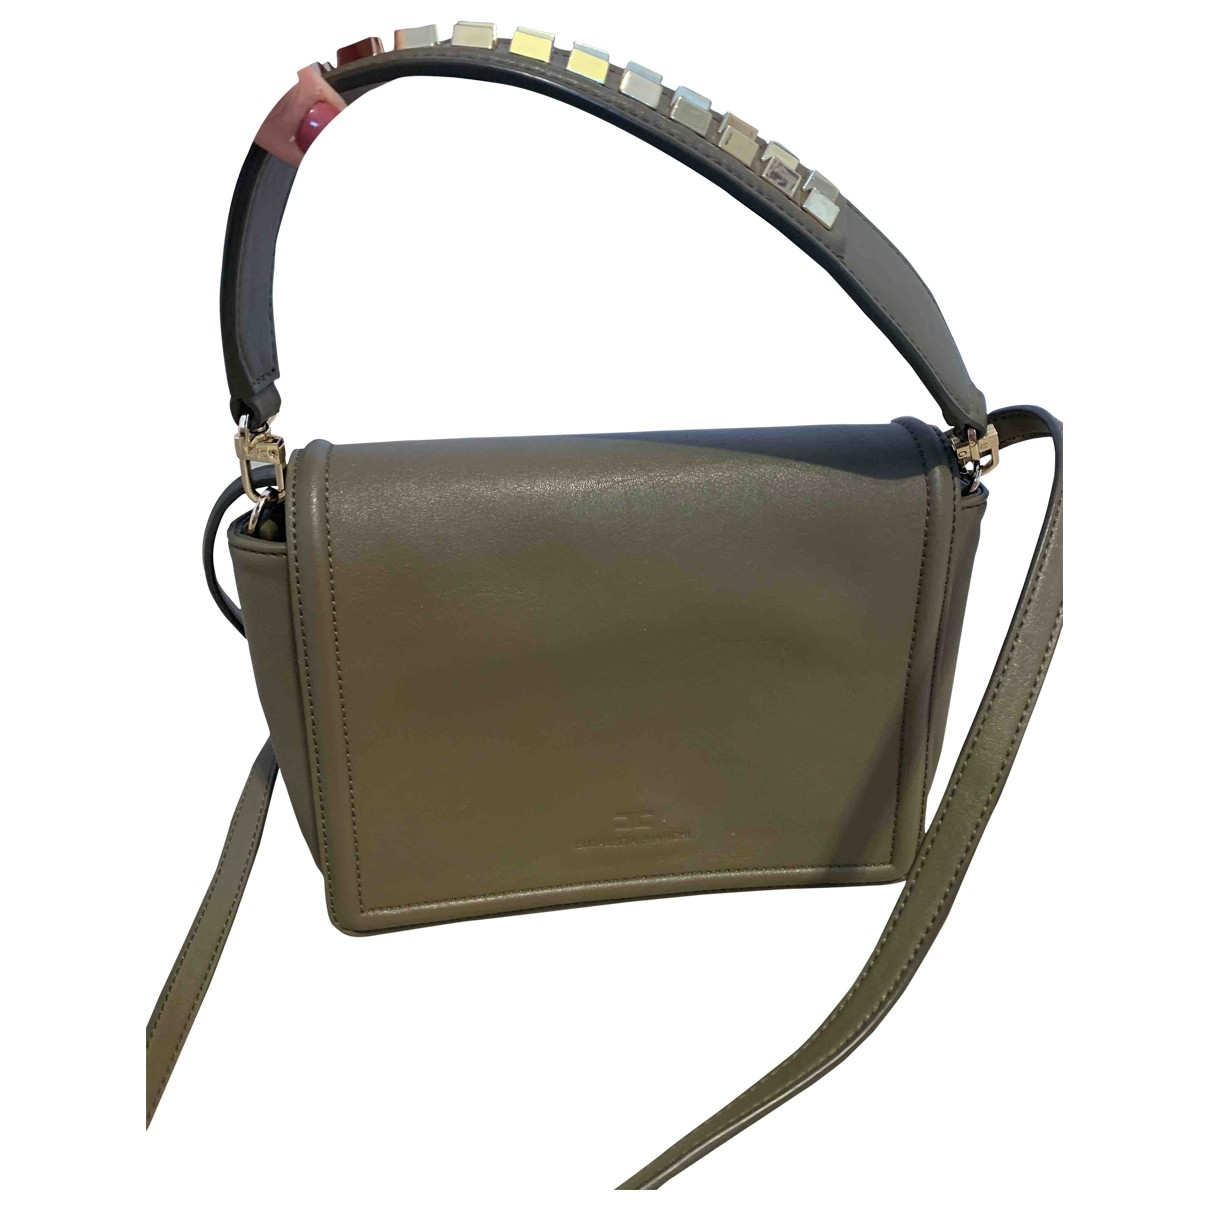 Elisabetta Franchi \N Handtasche in  Beige Leder